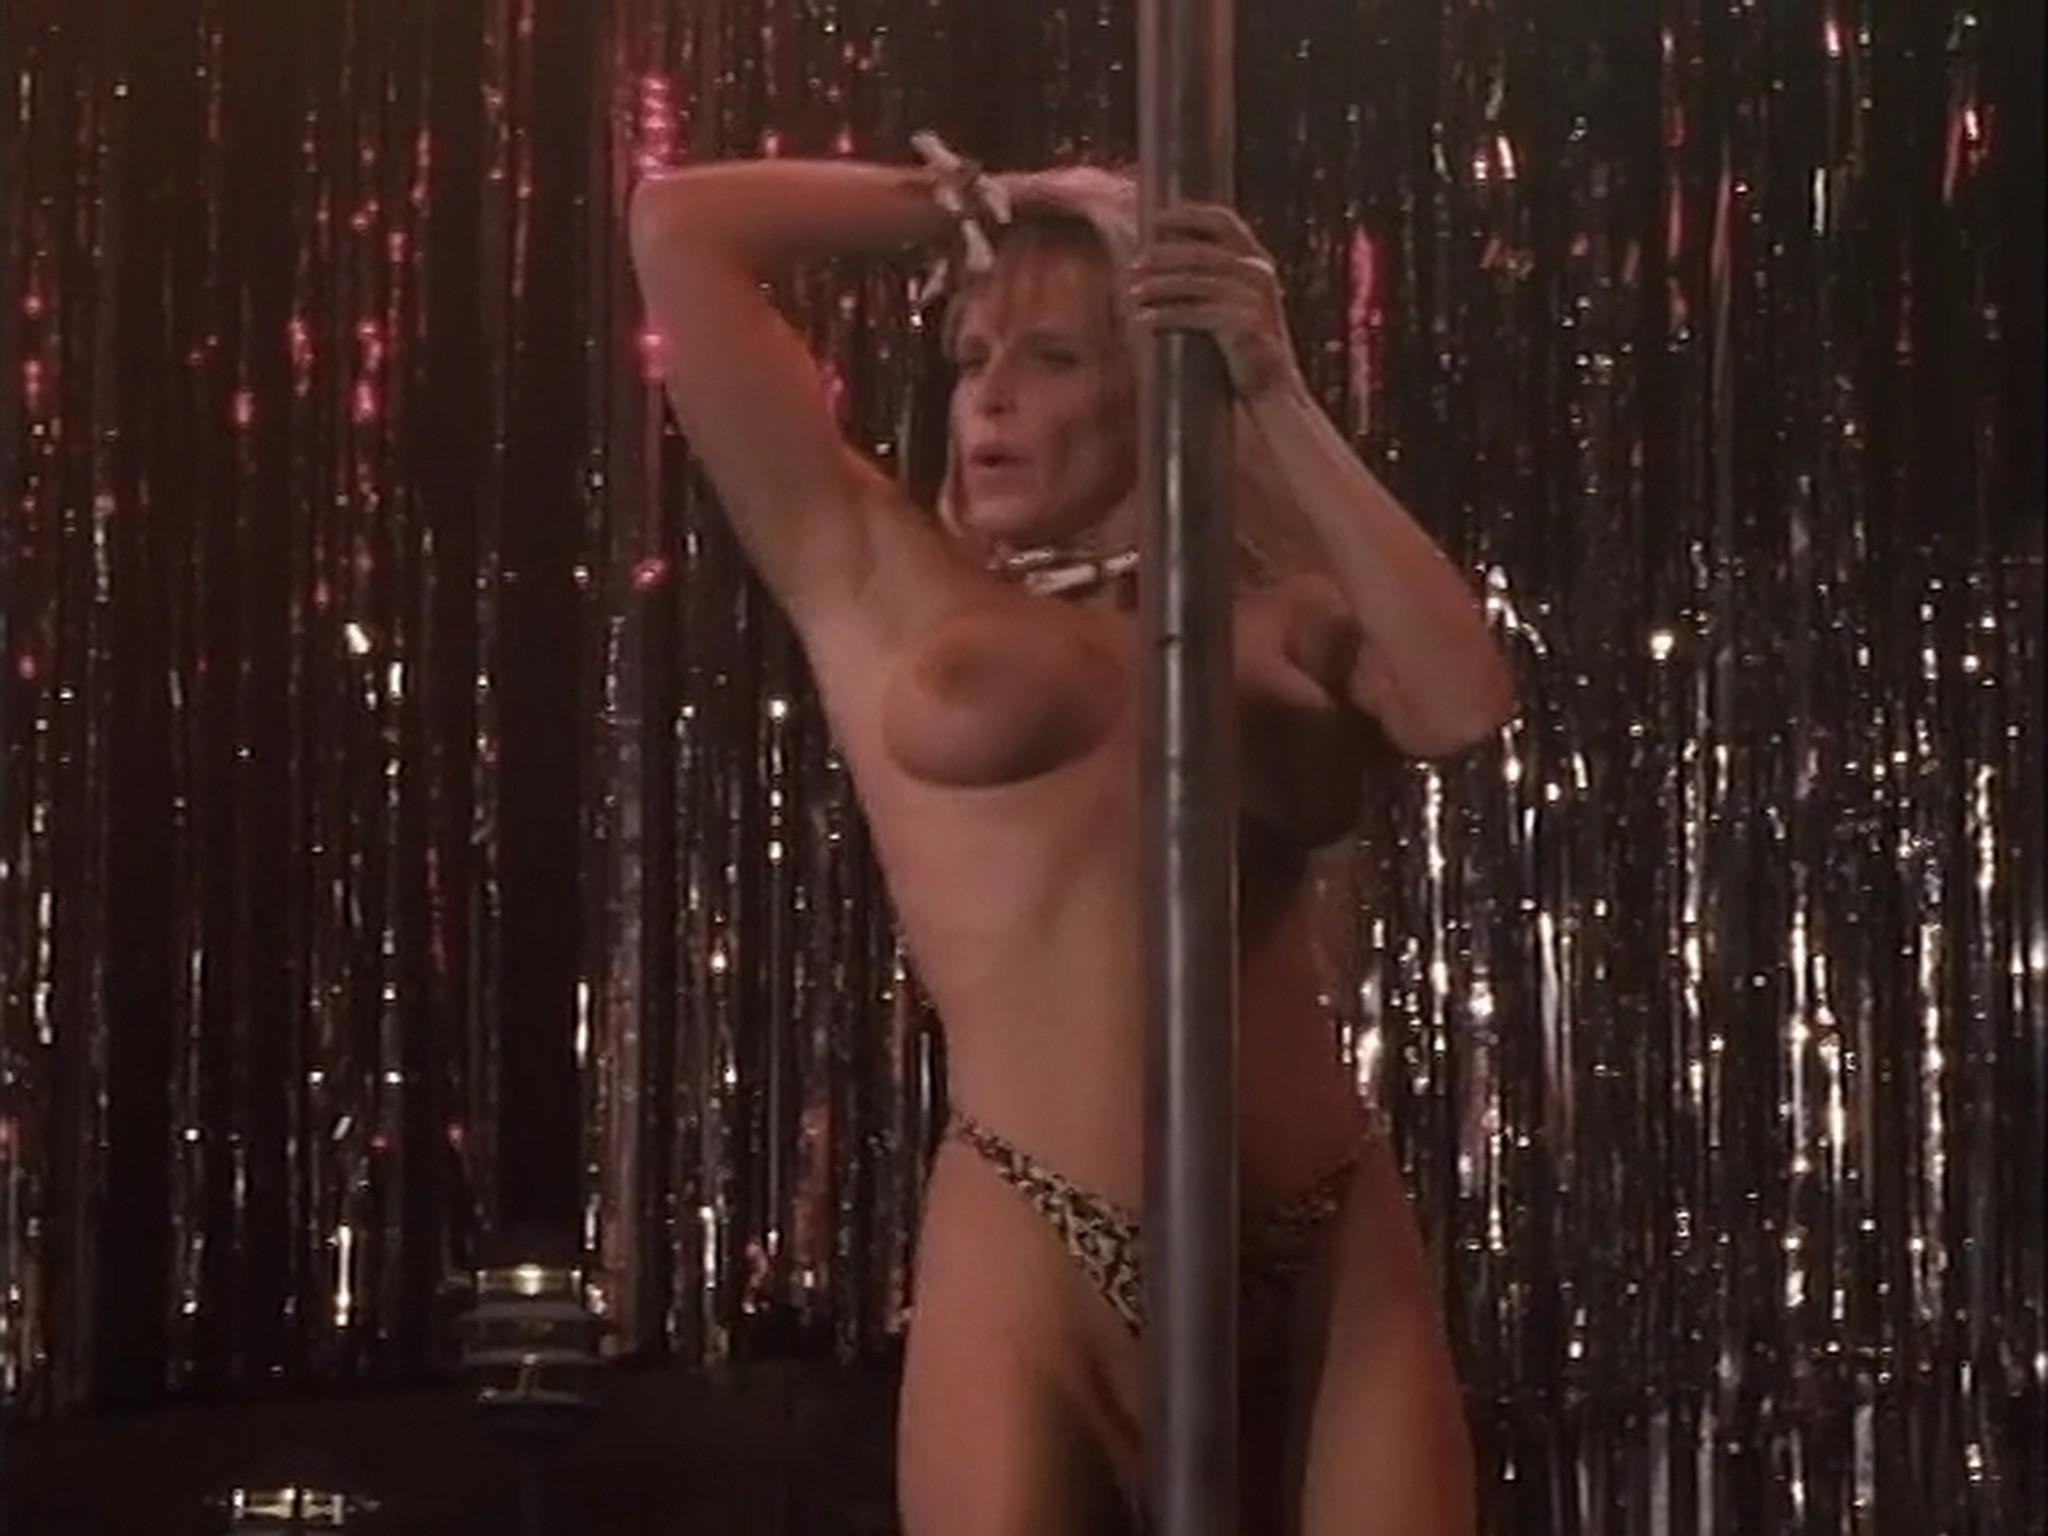 Barbara Alyn Woods nude Catya Sassoon Jill Pierce nude too as strippers Dance with Death 1991 2